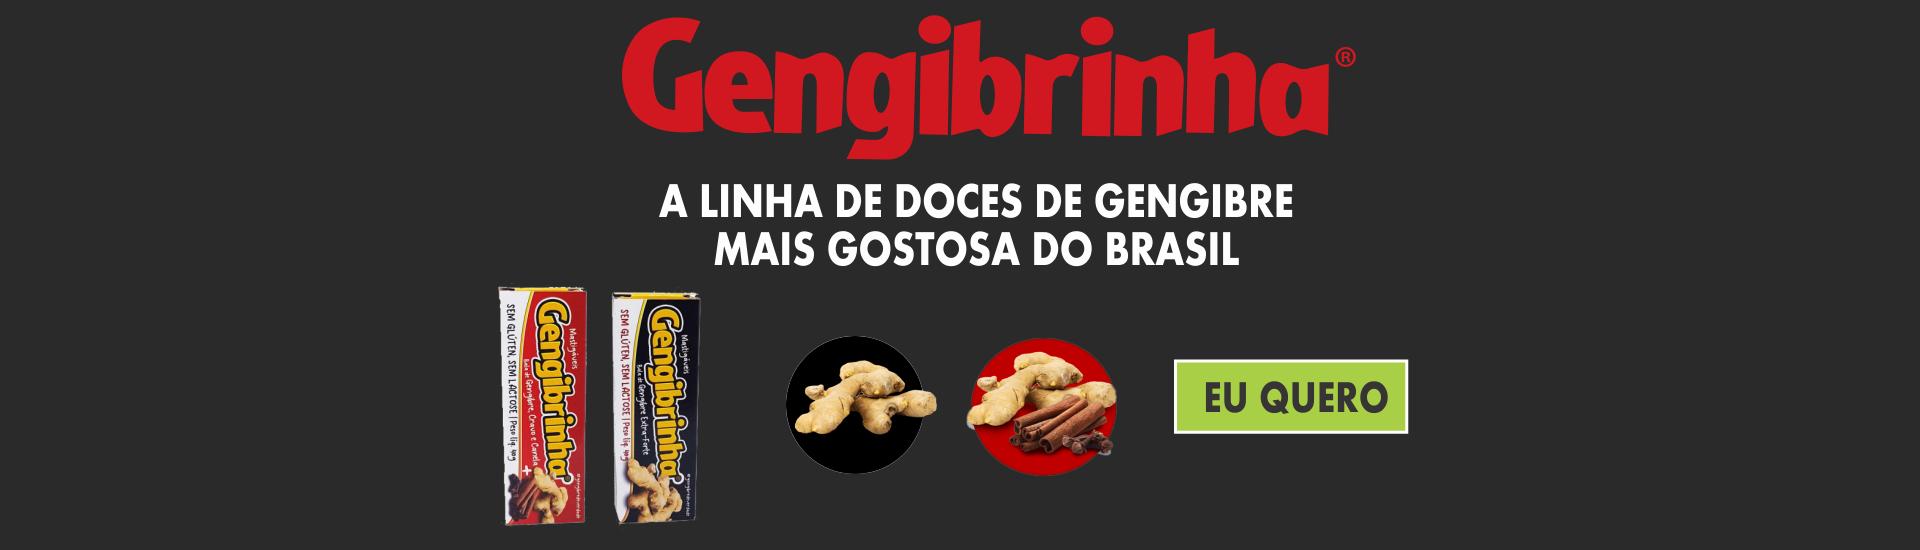 Gengibrinha